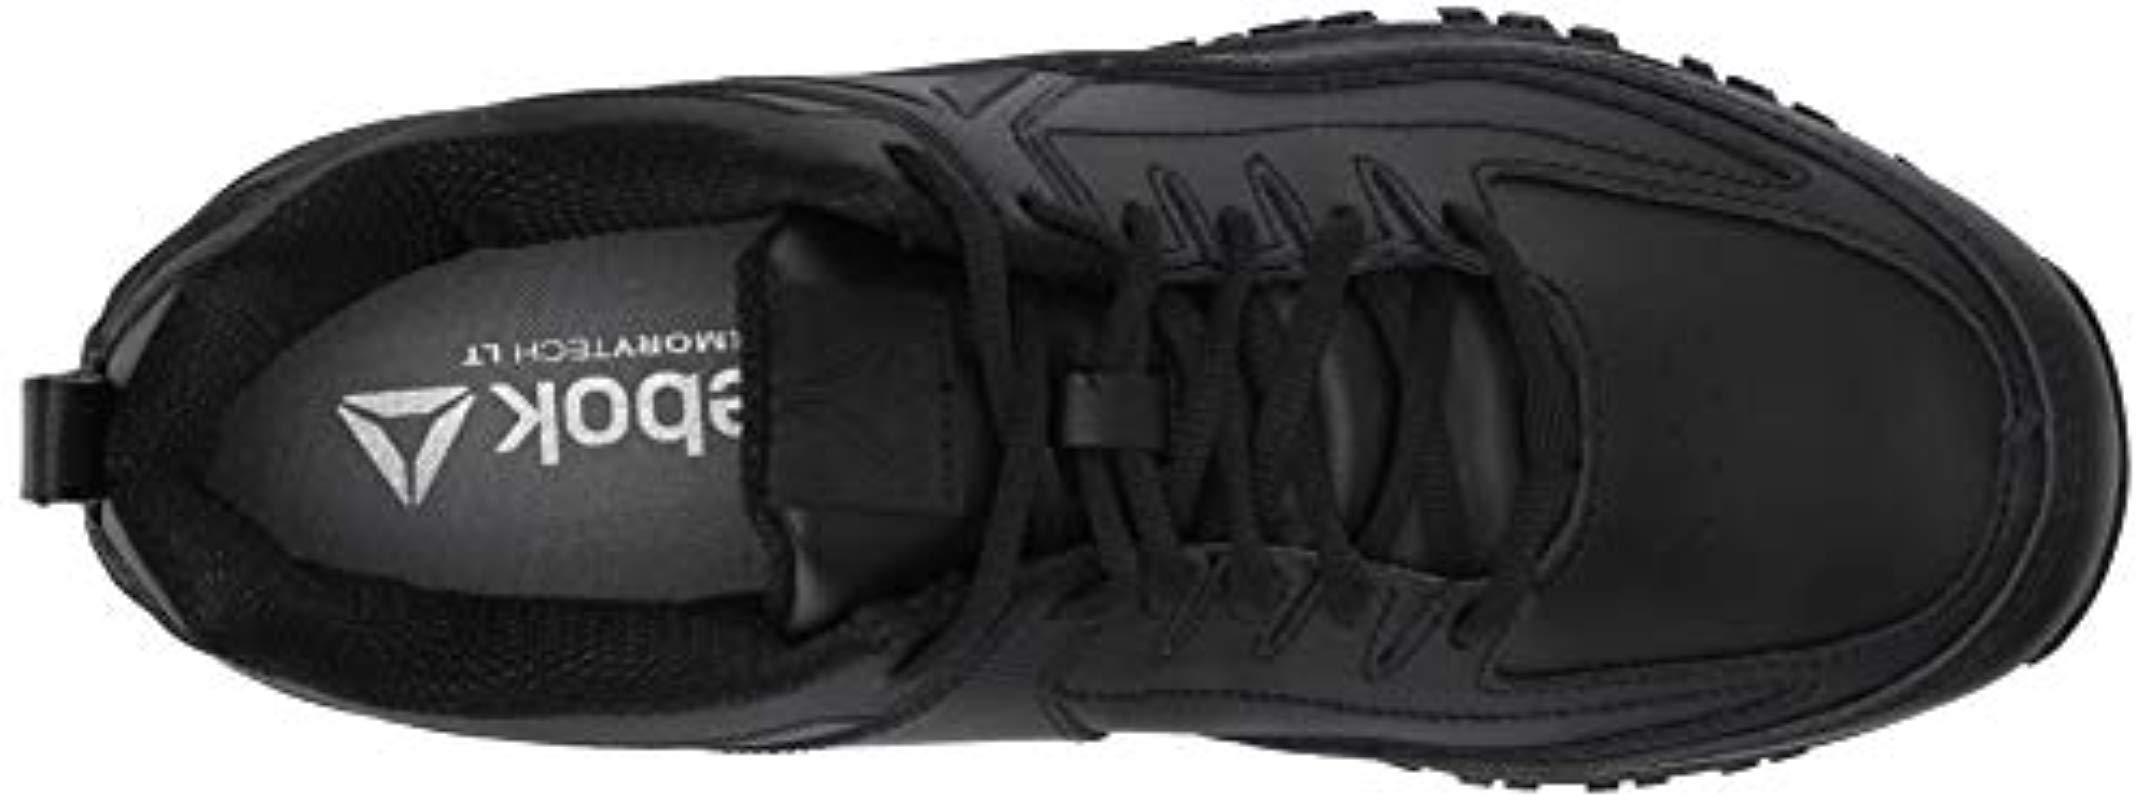 e1a2fba00dad1a Reebok - Black Ridgerider Leather 4e Sneaker for Men - Lyst. View fullscreen